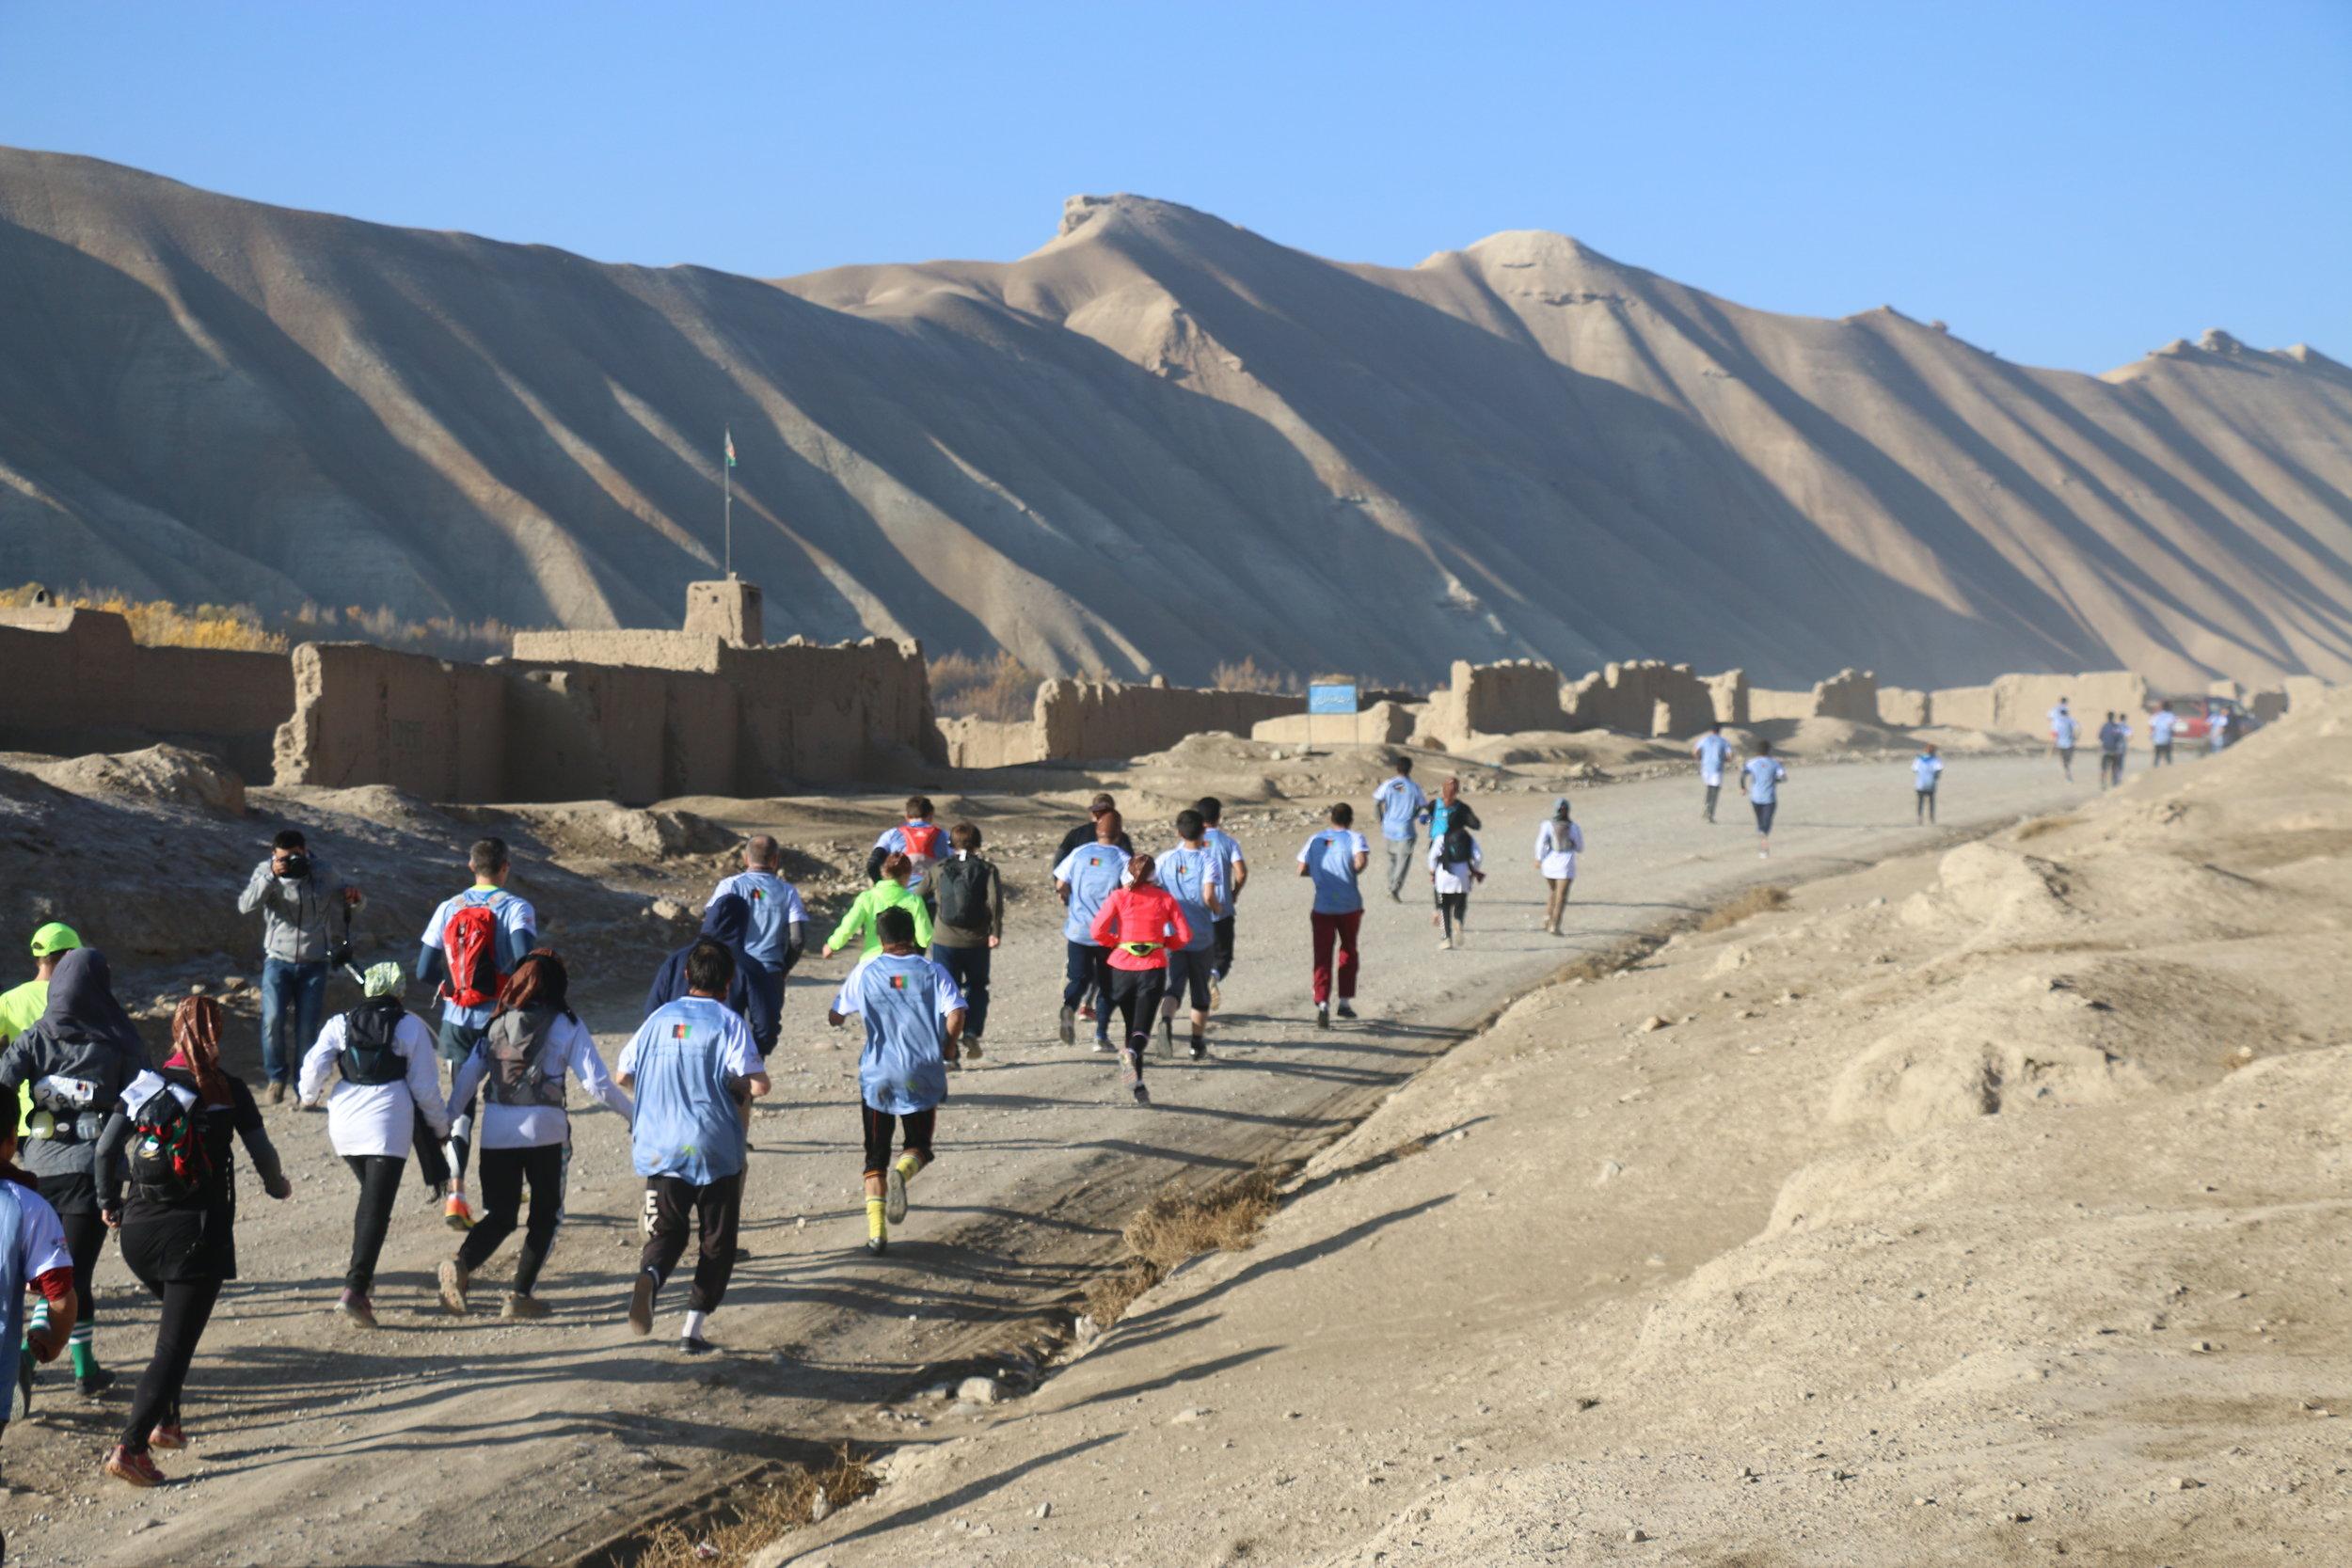 Runners in the 2016 Marathon of Afghanistan.Credit: Latif Azimi